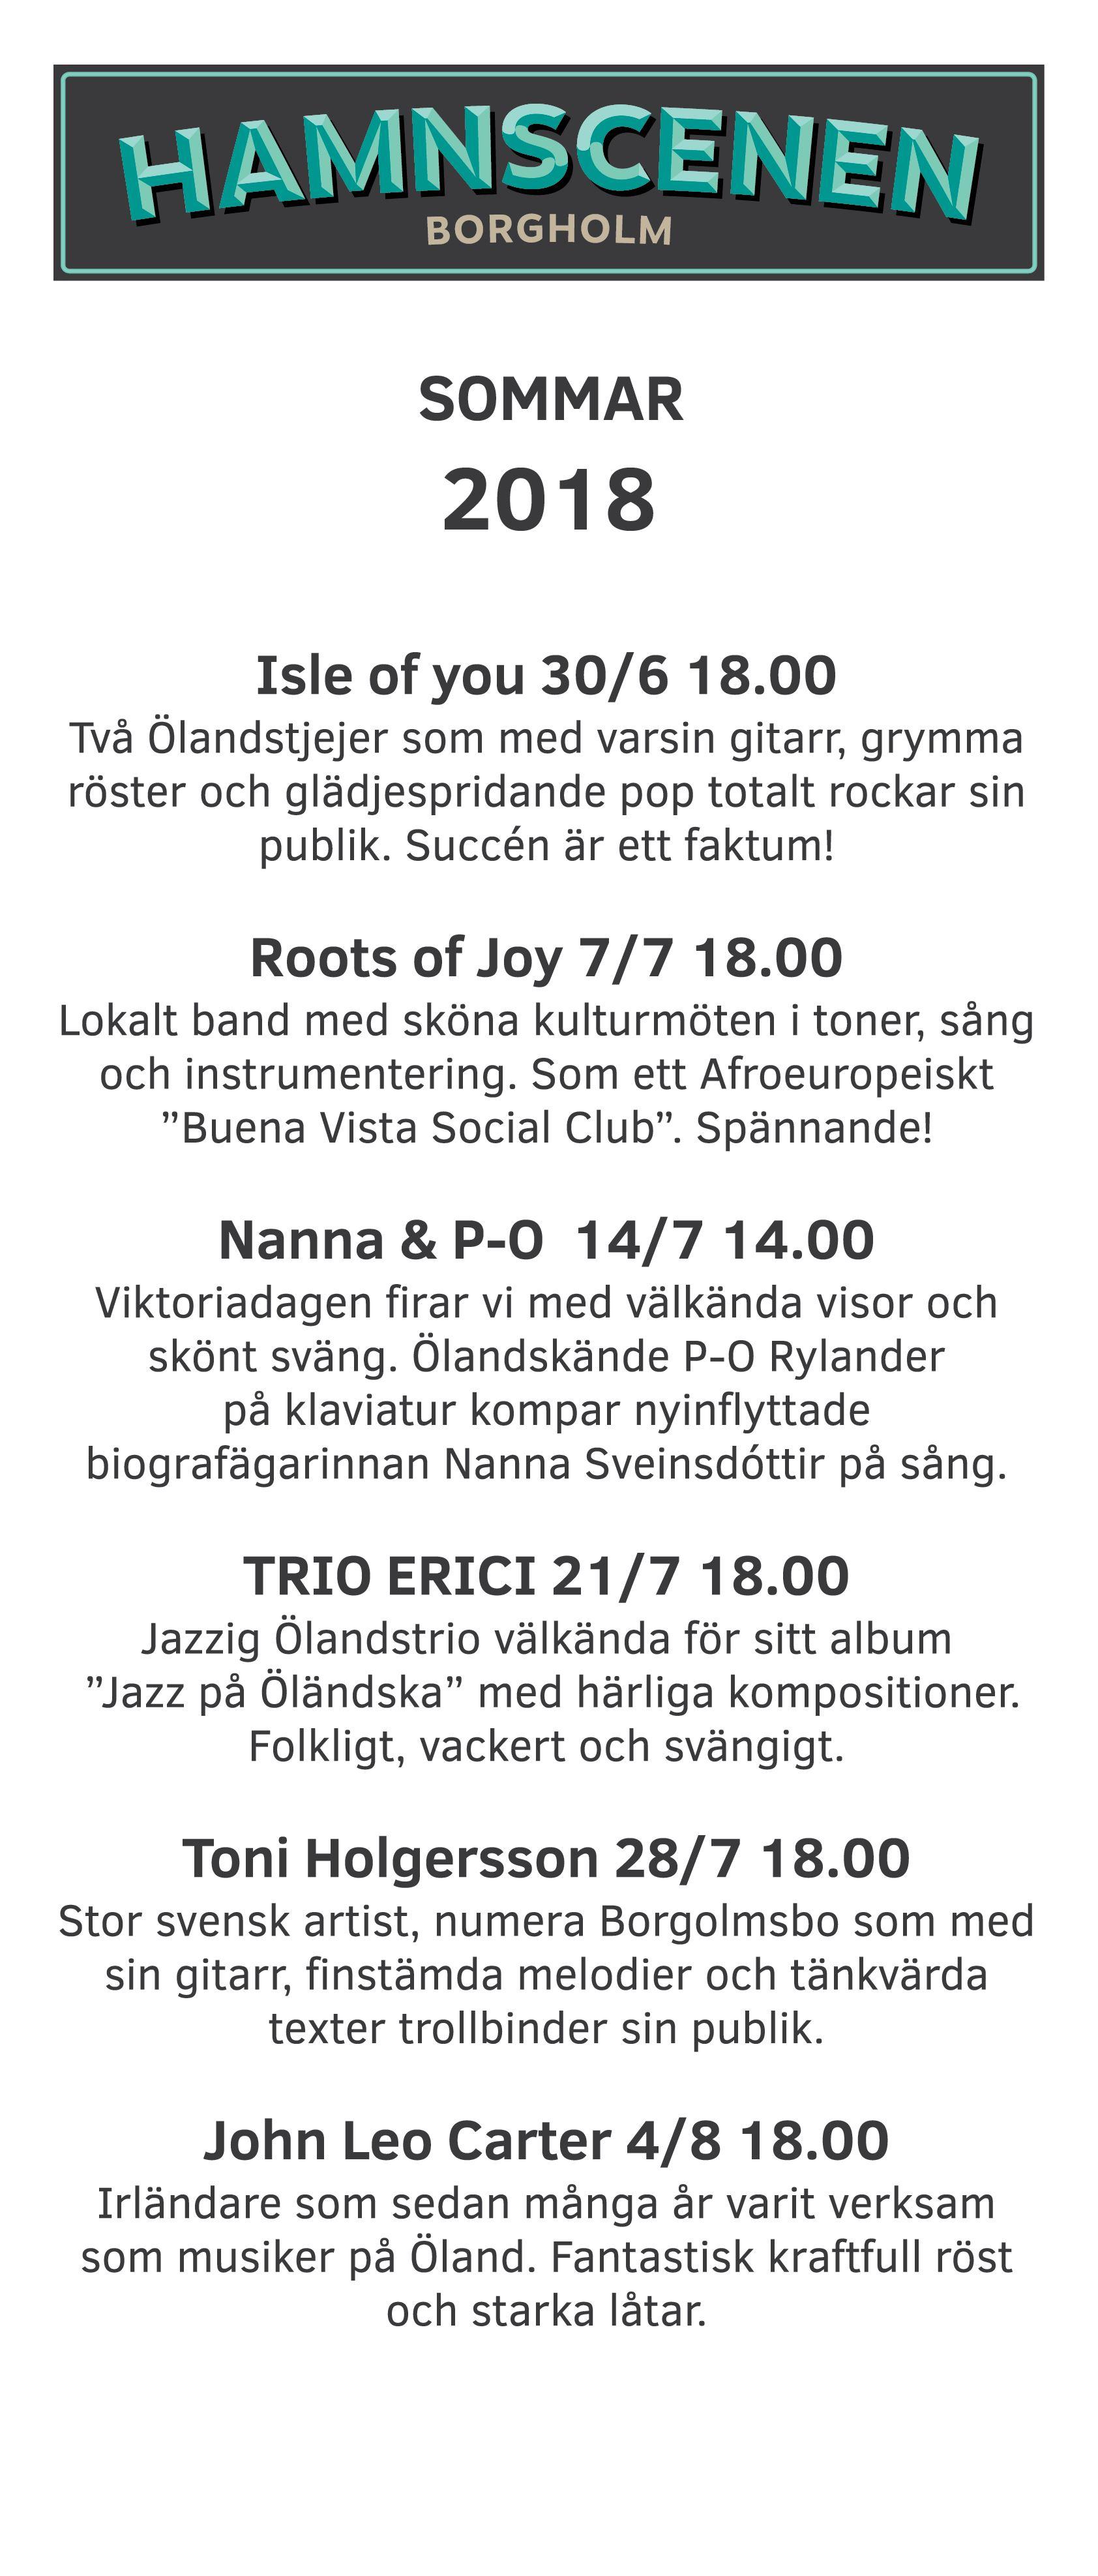 Hamnscenen Borgholm - Toni Holgersson